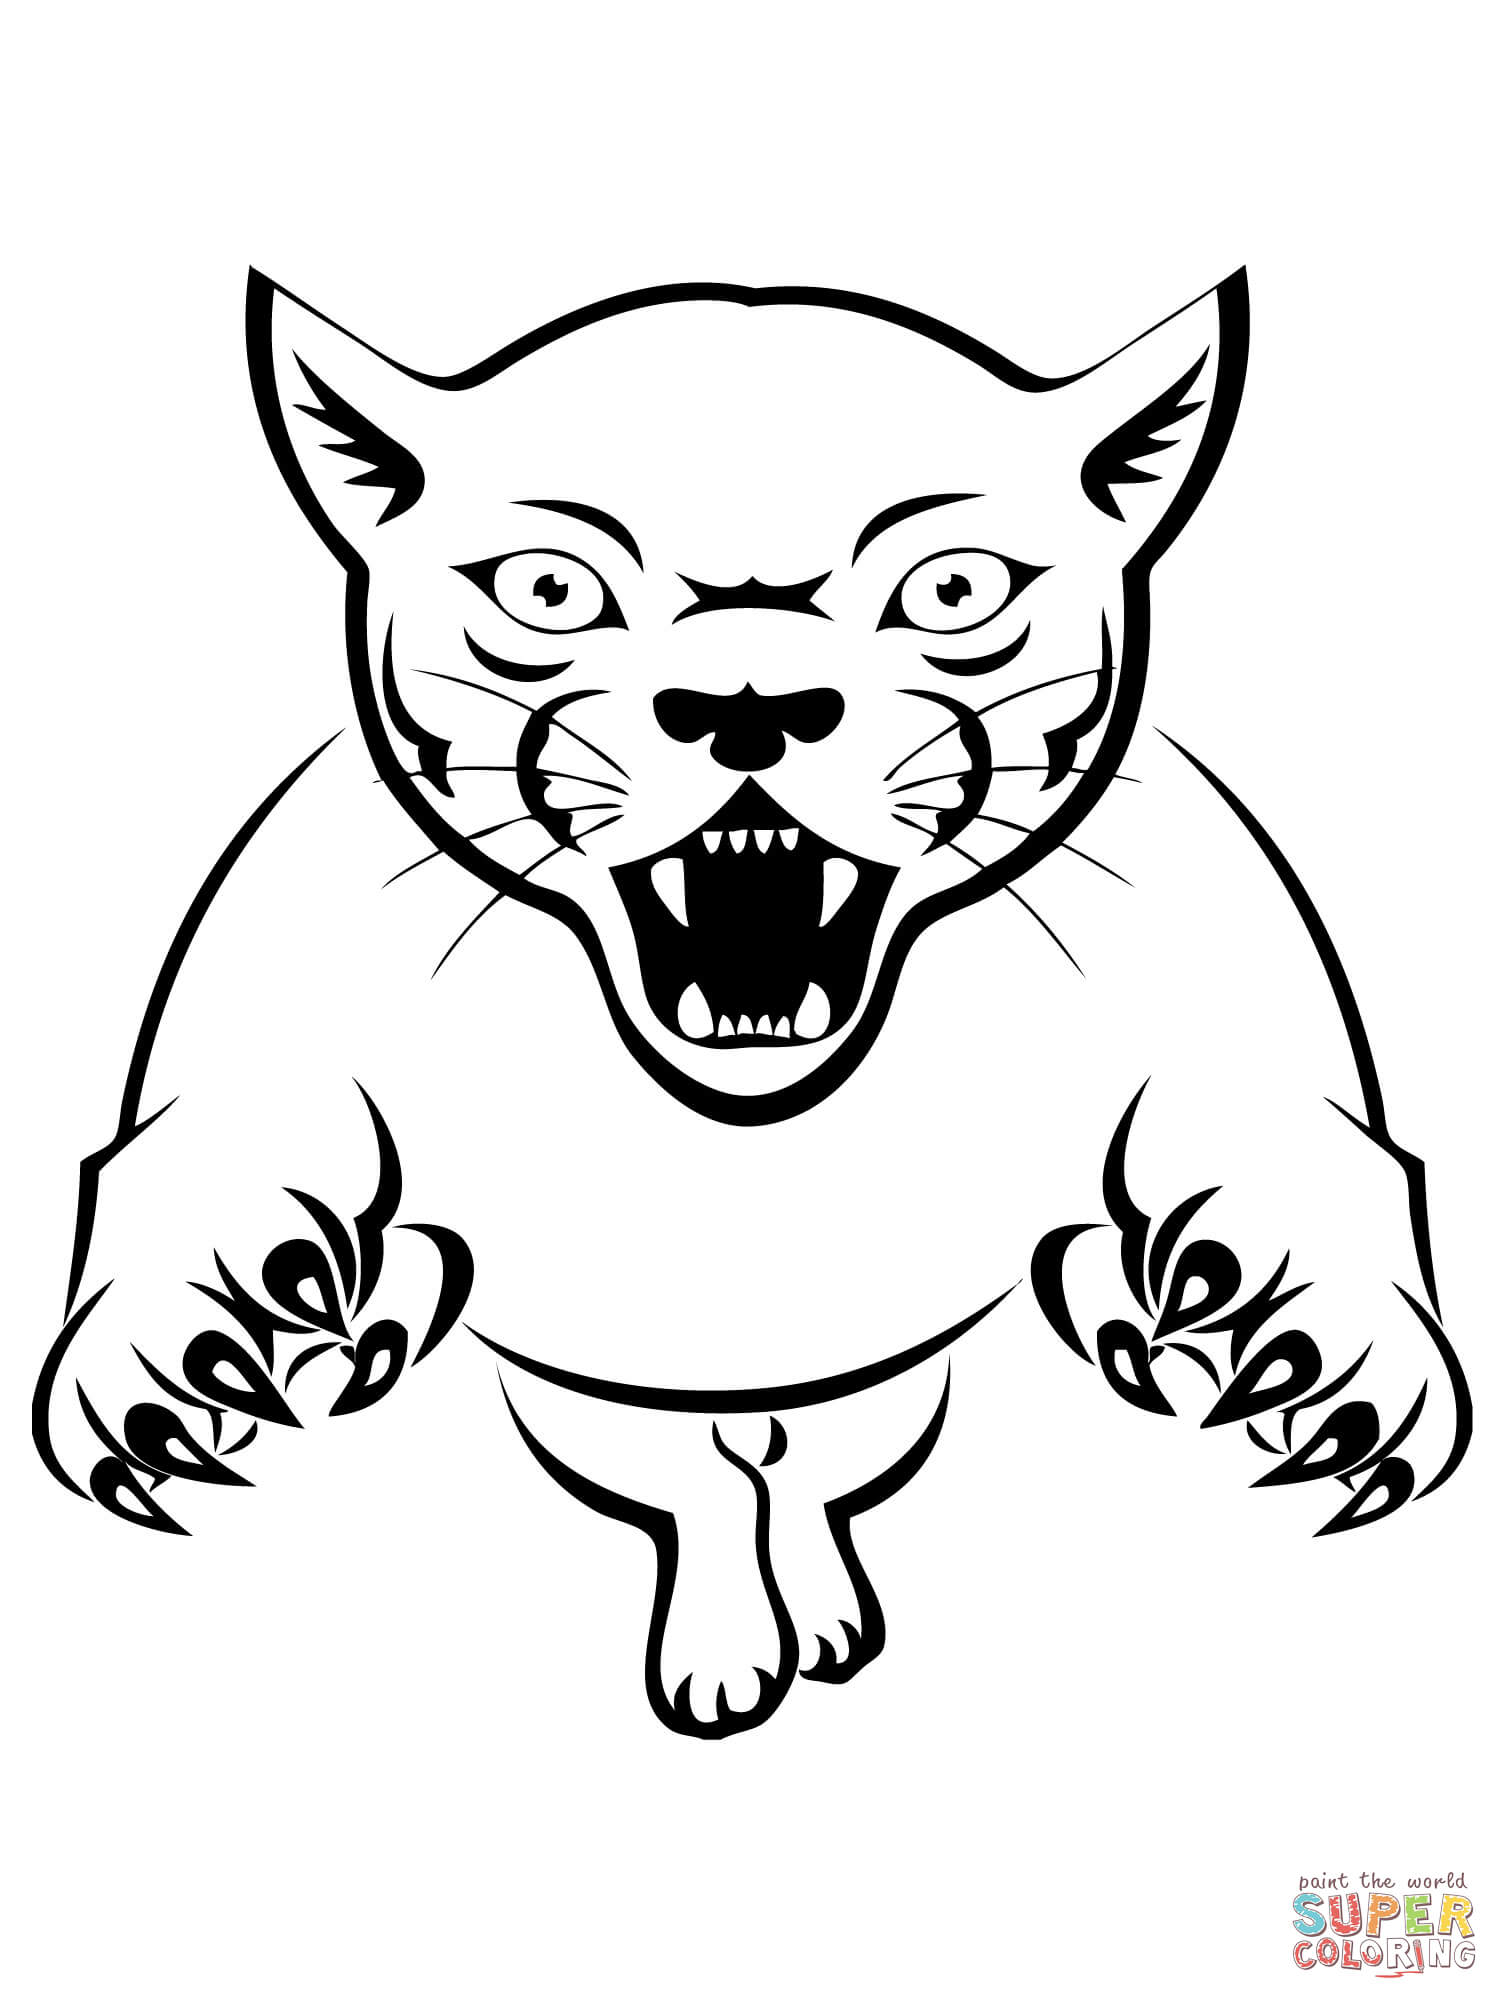 Coloriage - Puma qui attaque Coloriages à imprimer gratuits